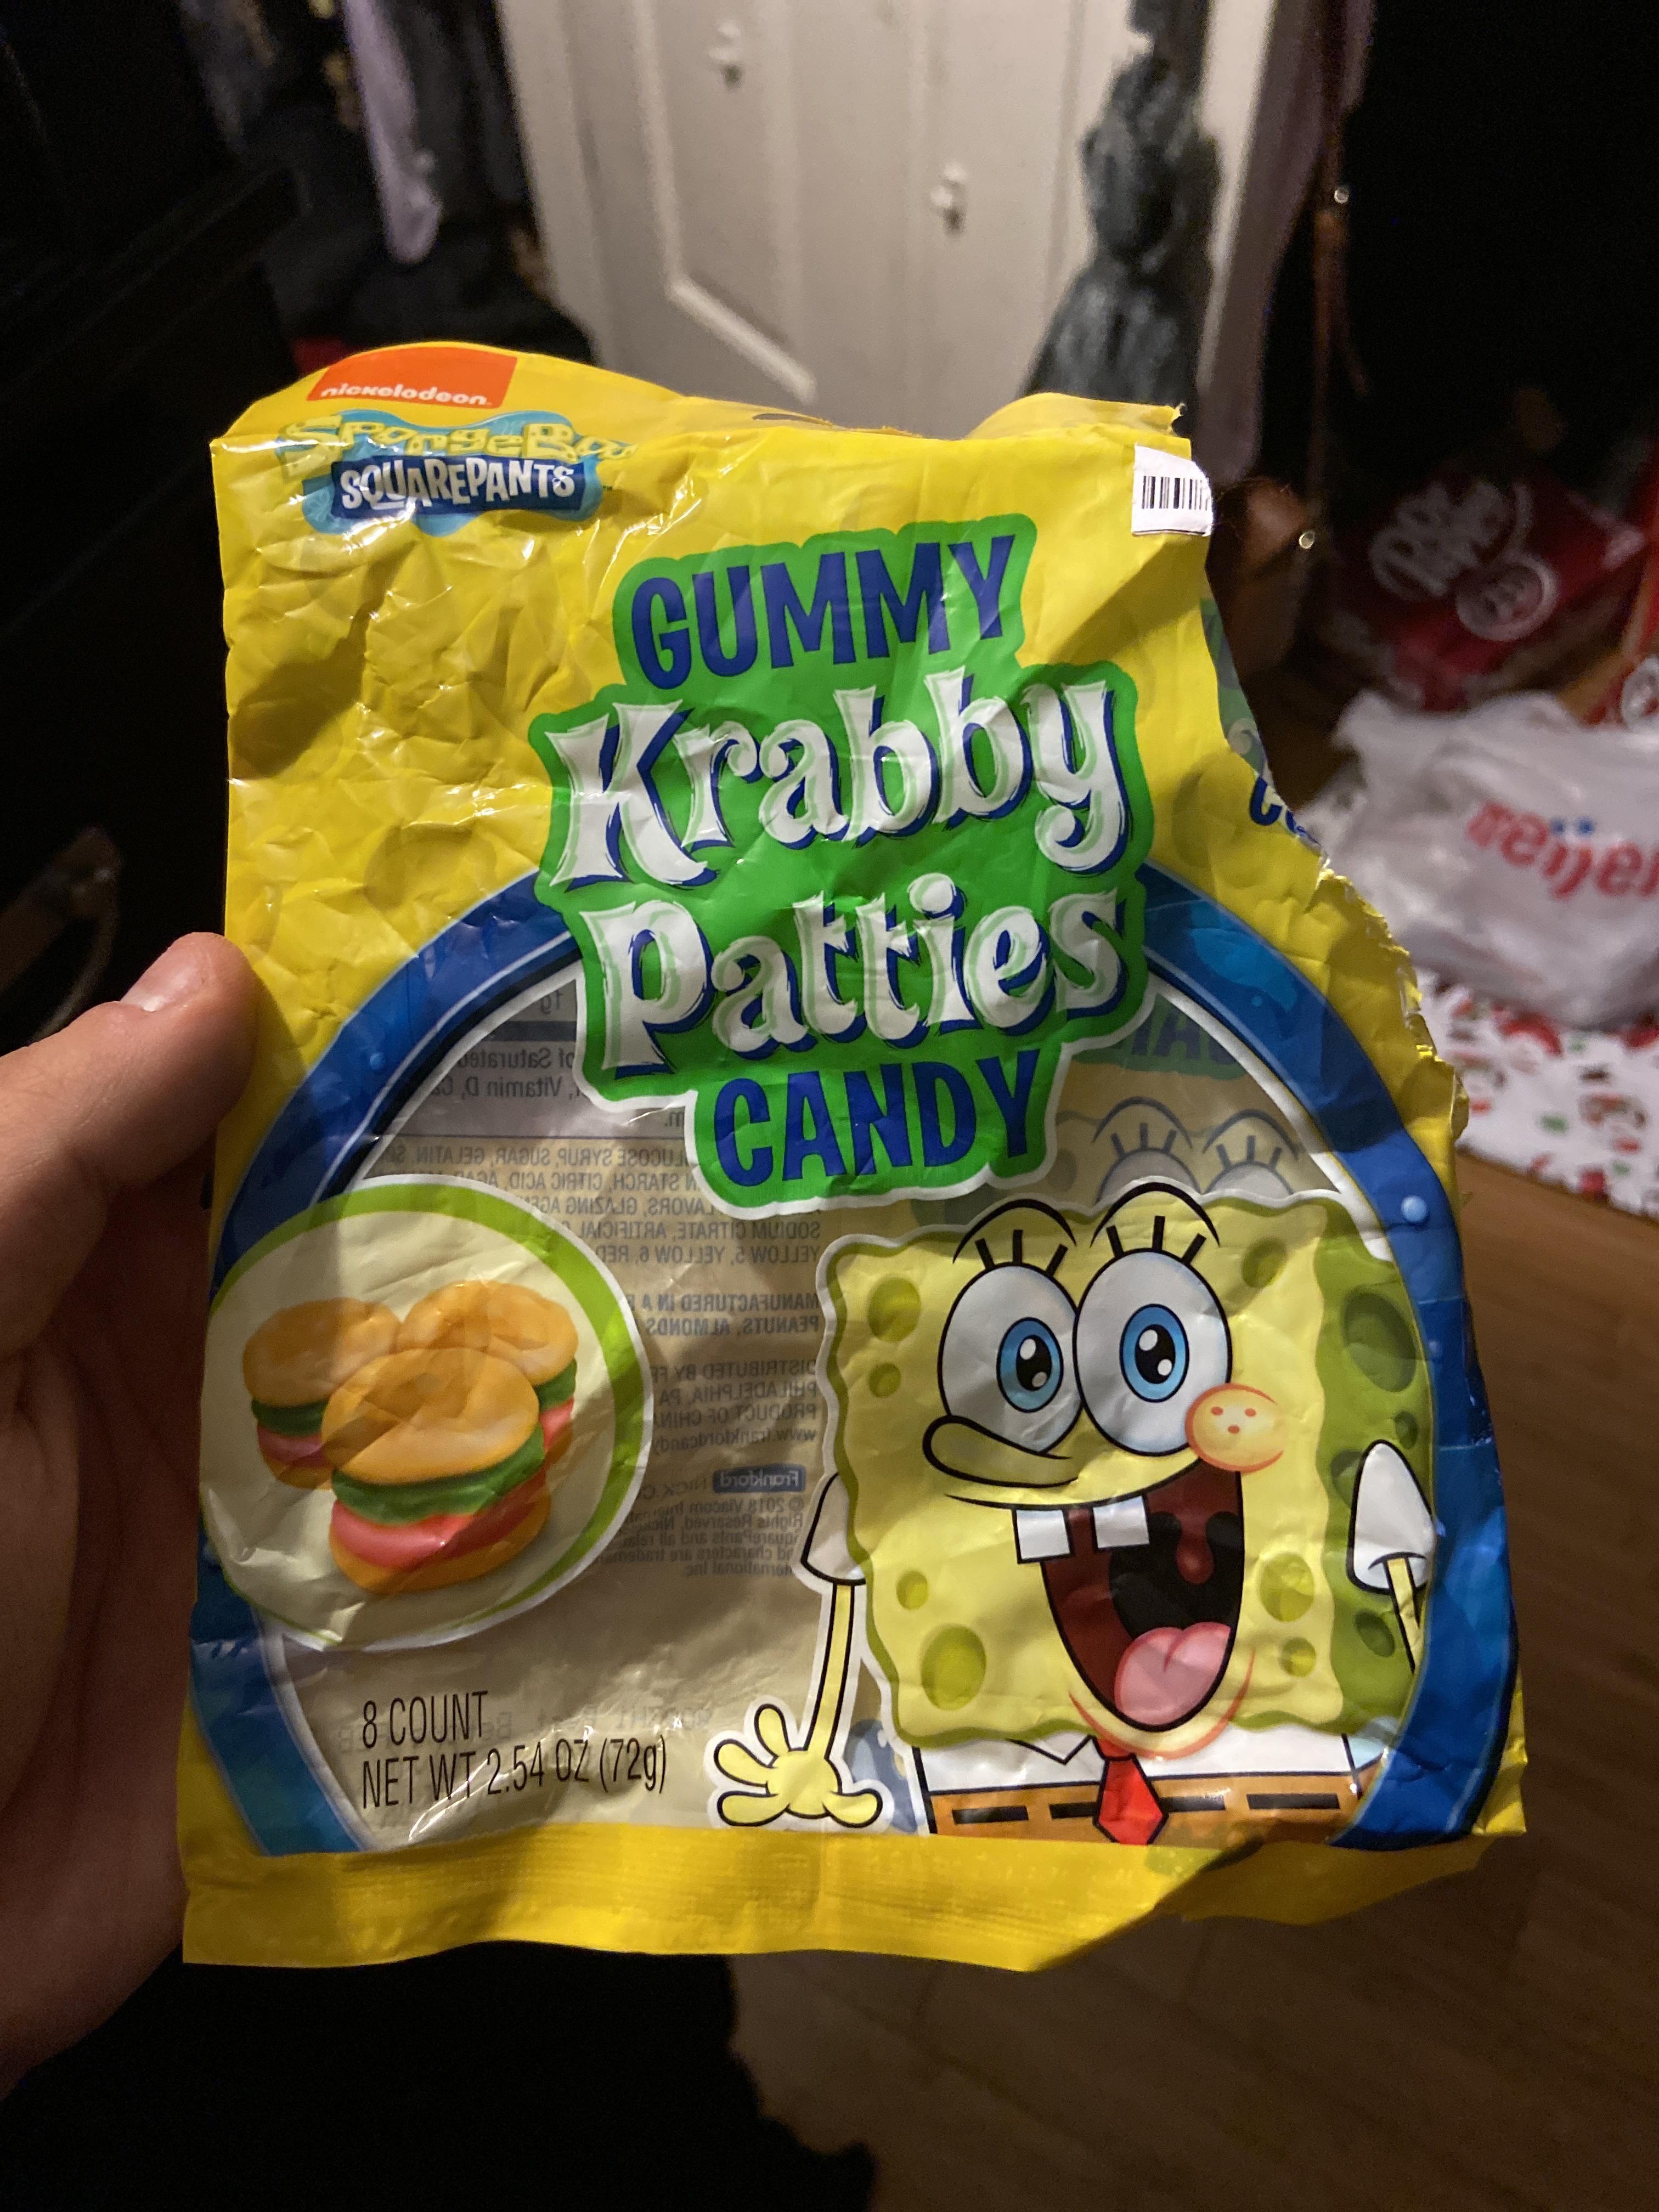 Spongebob Secret Formula : spongebob, secret, formula, What's, Krabby, Patty, Secret, Formula, Gummy?, Friends, Taste, Testing, Couldn't, Figure, KNOW!!!